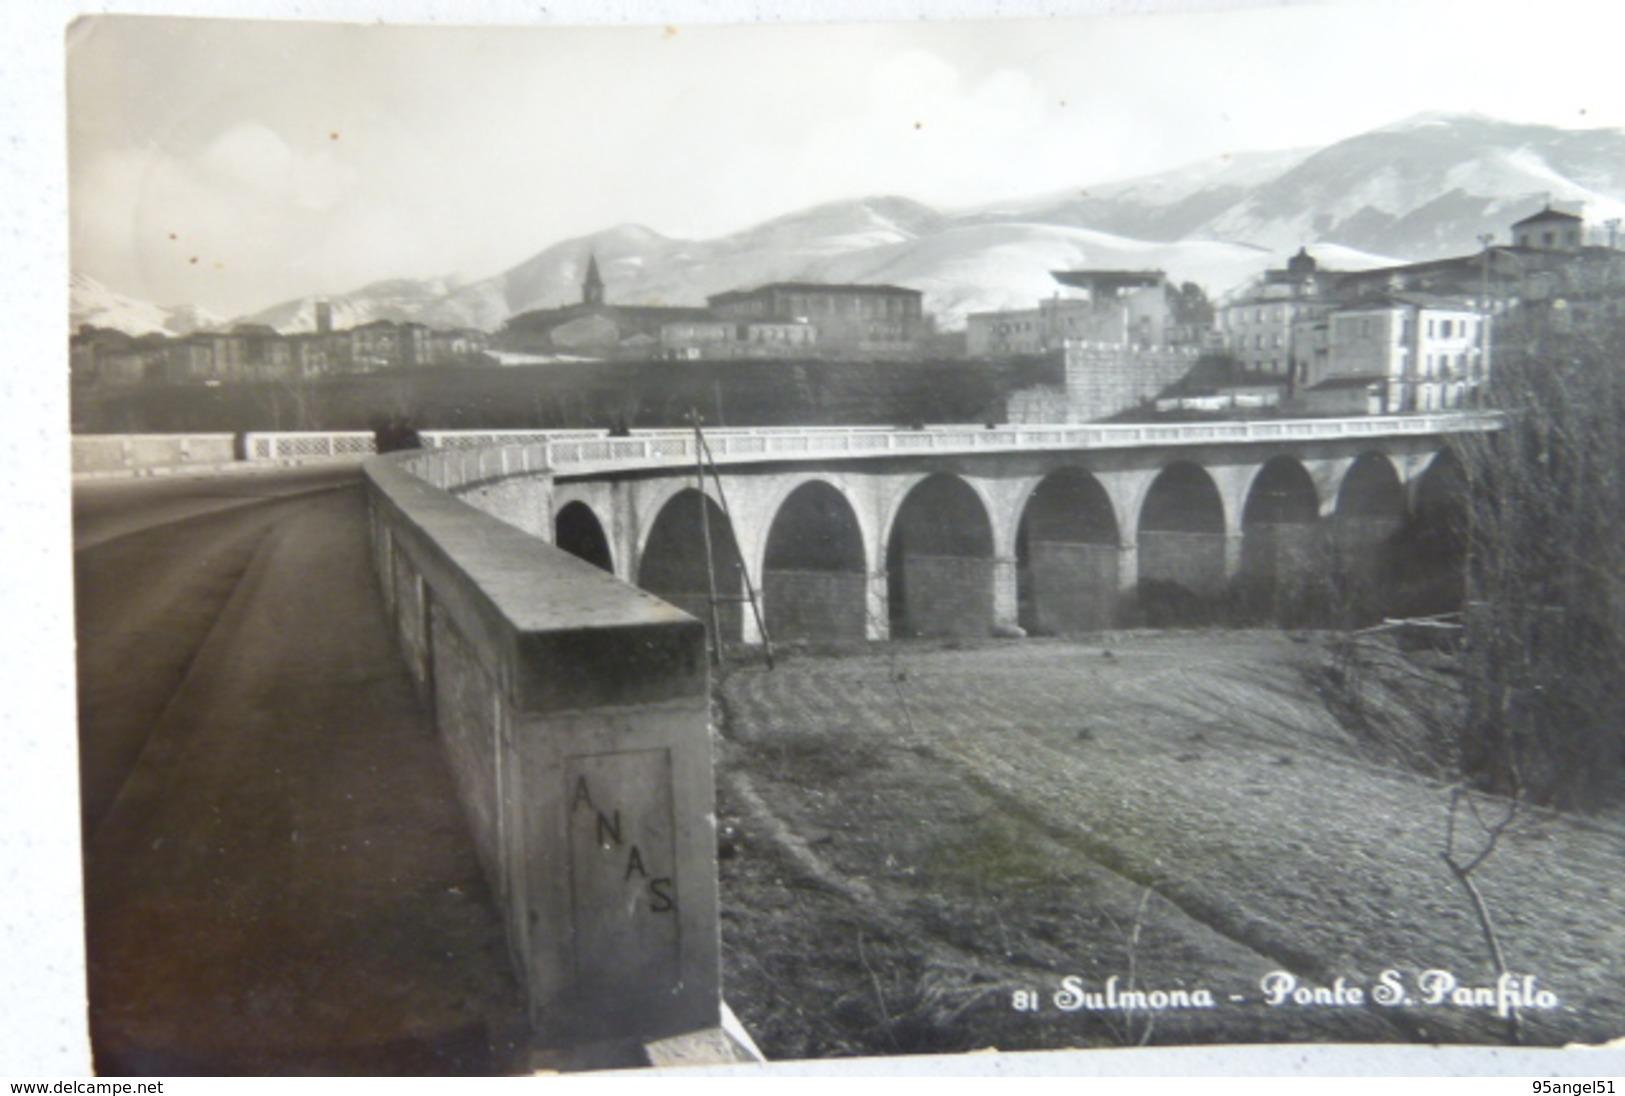 SULMONA (L'AQUILA) - PONTE S.PANFILO - L'Aquila